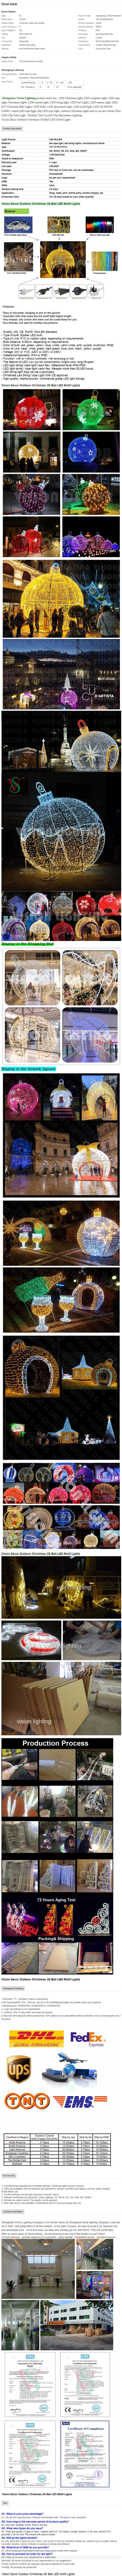 Vision Decor Outdoor Christmas 3D Ball LED Motif Lights